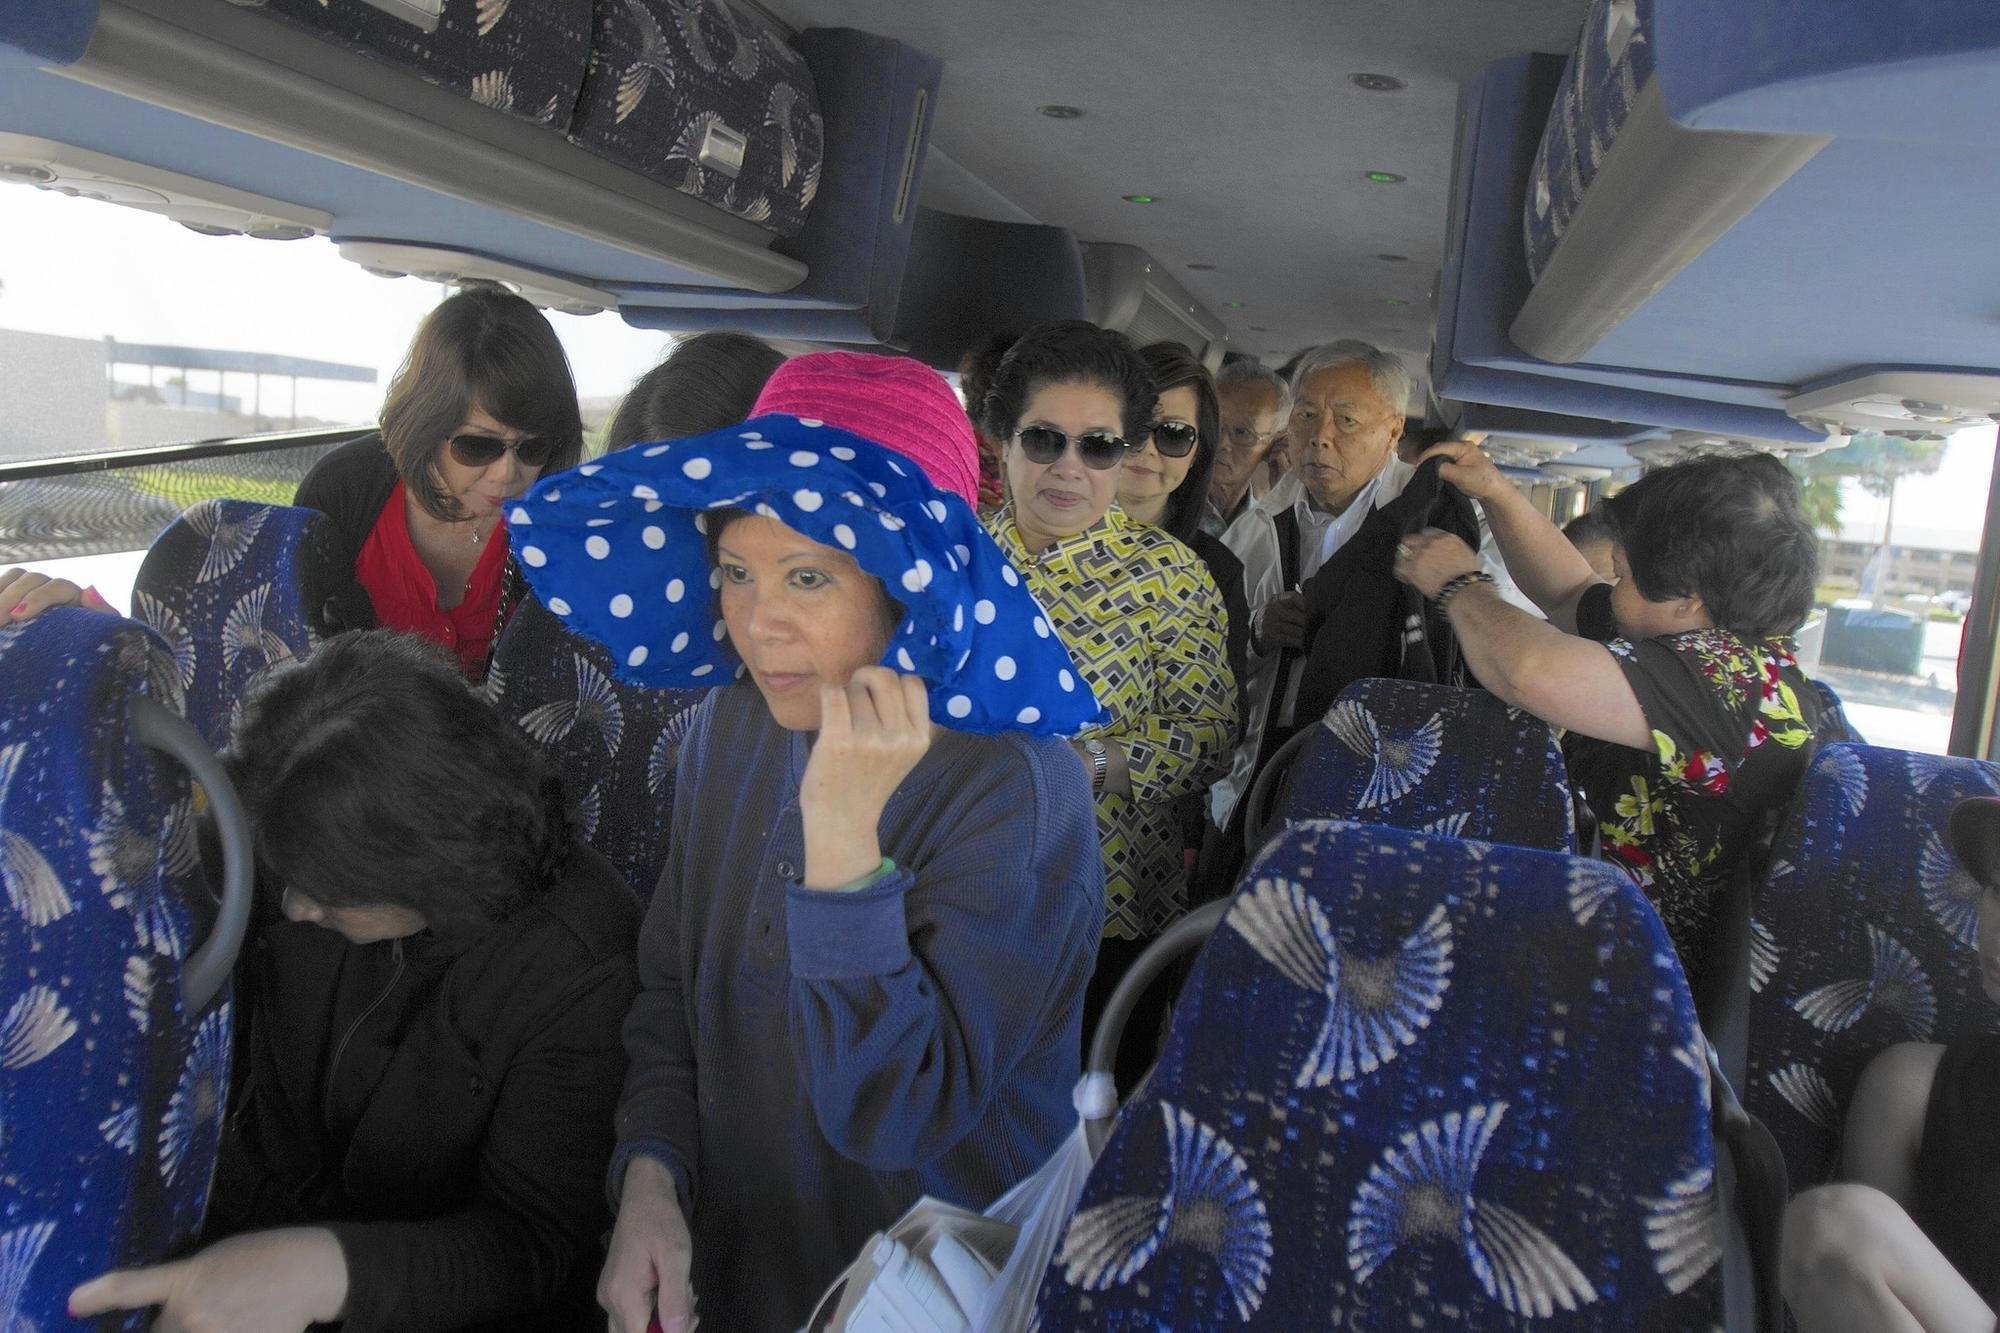 From Little Saigon to San Jose, a faithful bus connection